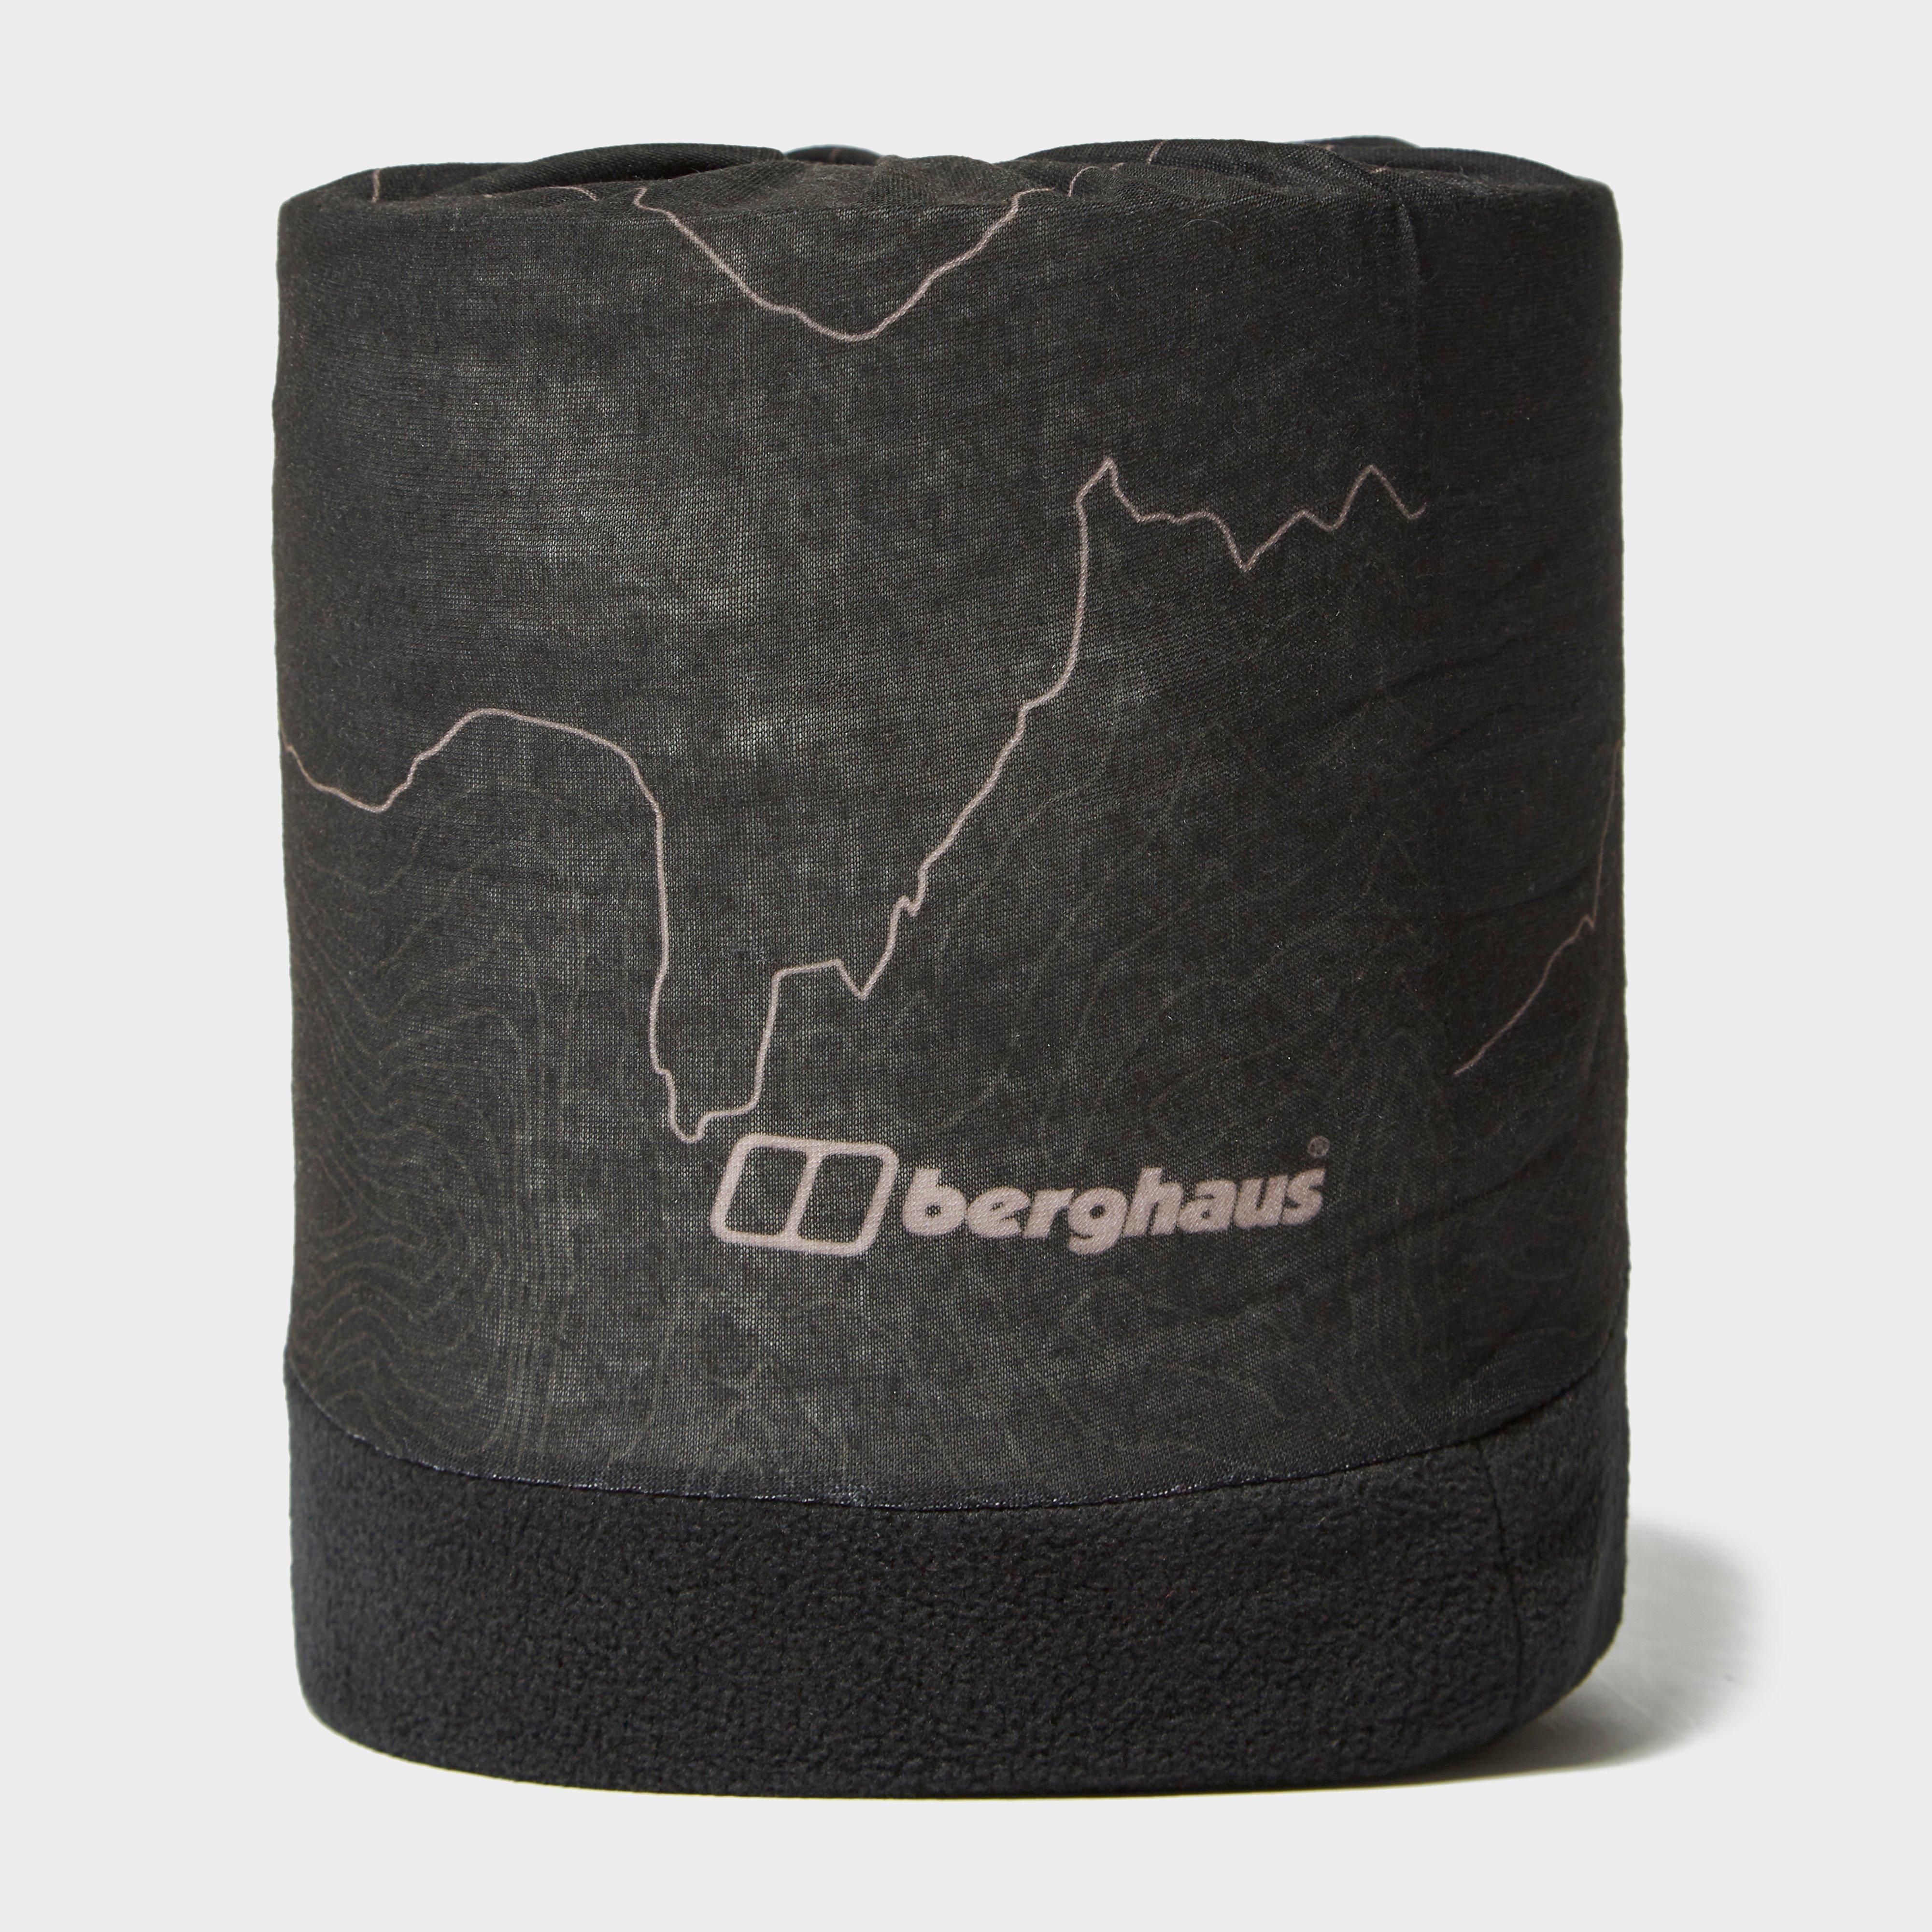 Berghaus Unisex Part Contour Neck Gaiter - Grey/dgy  Grey/dgy